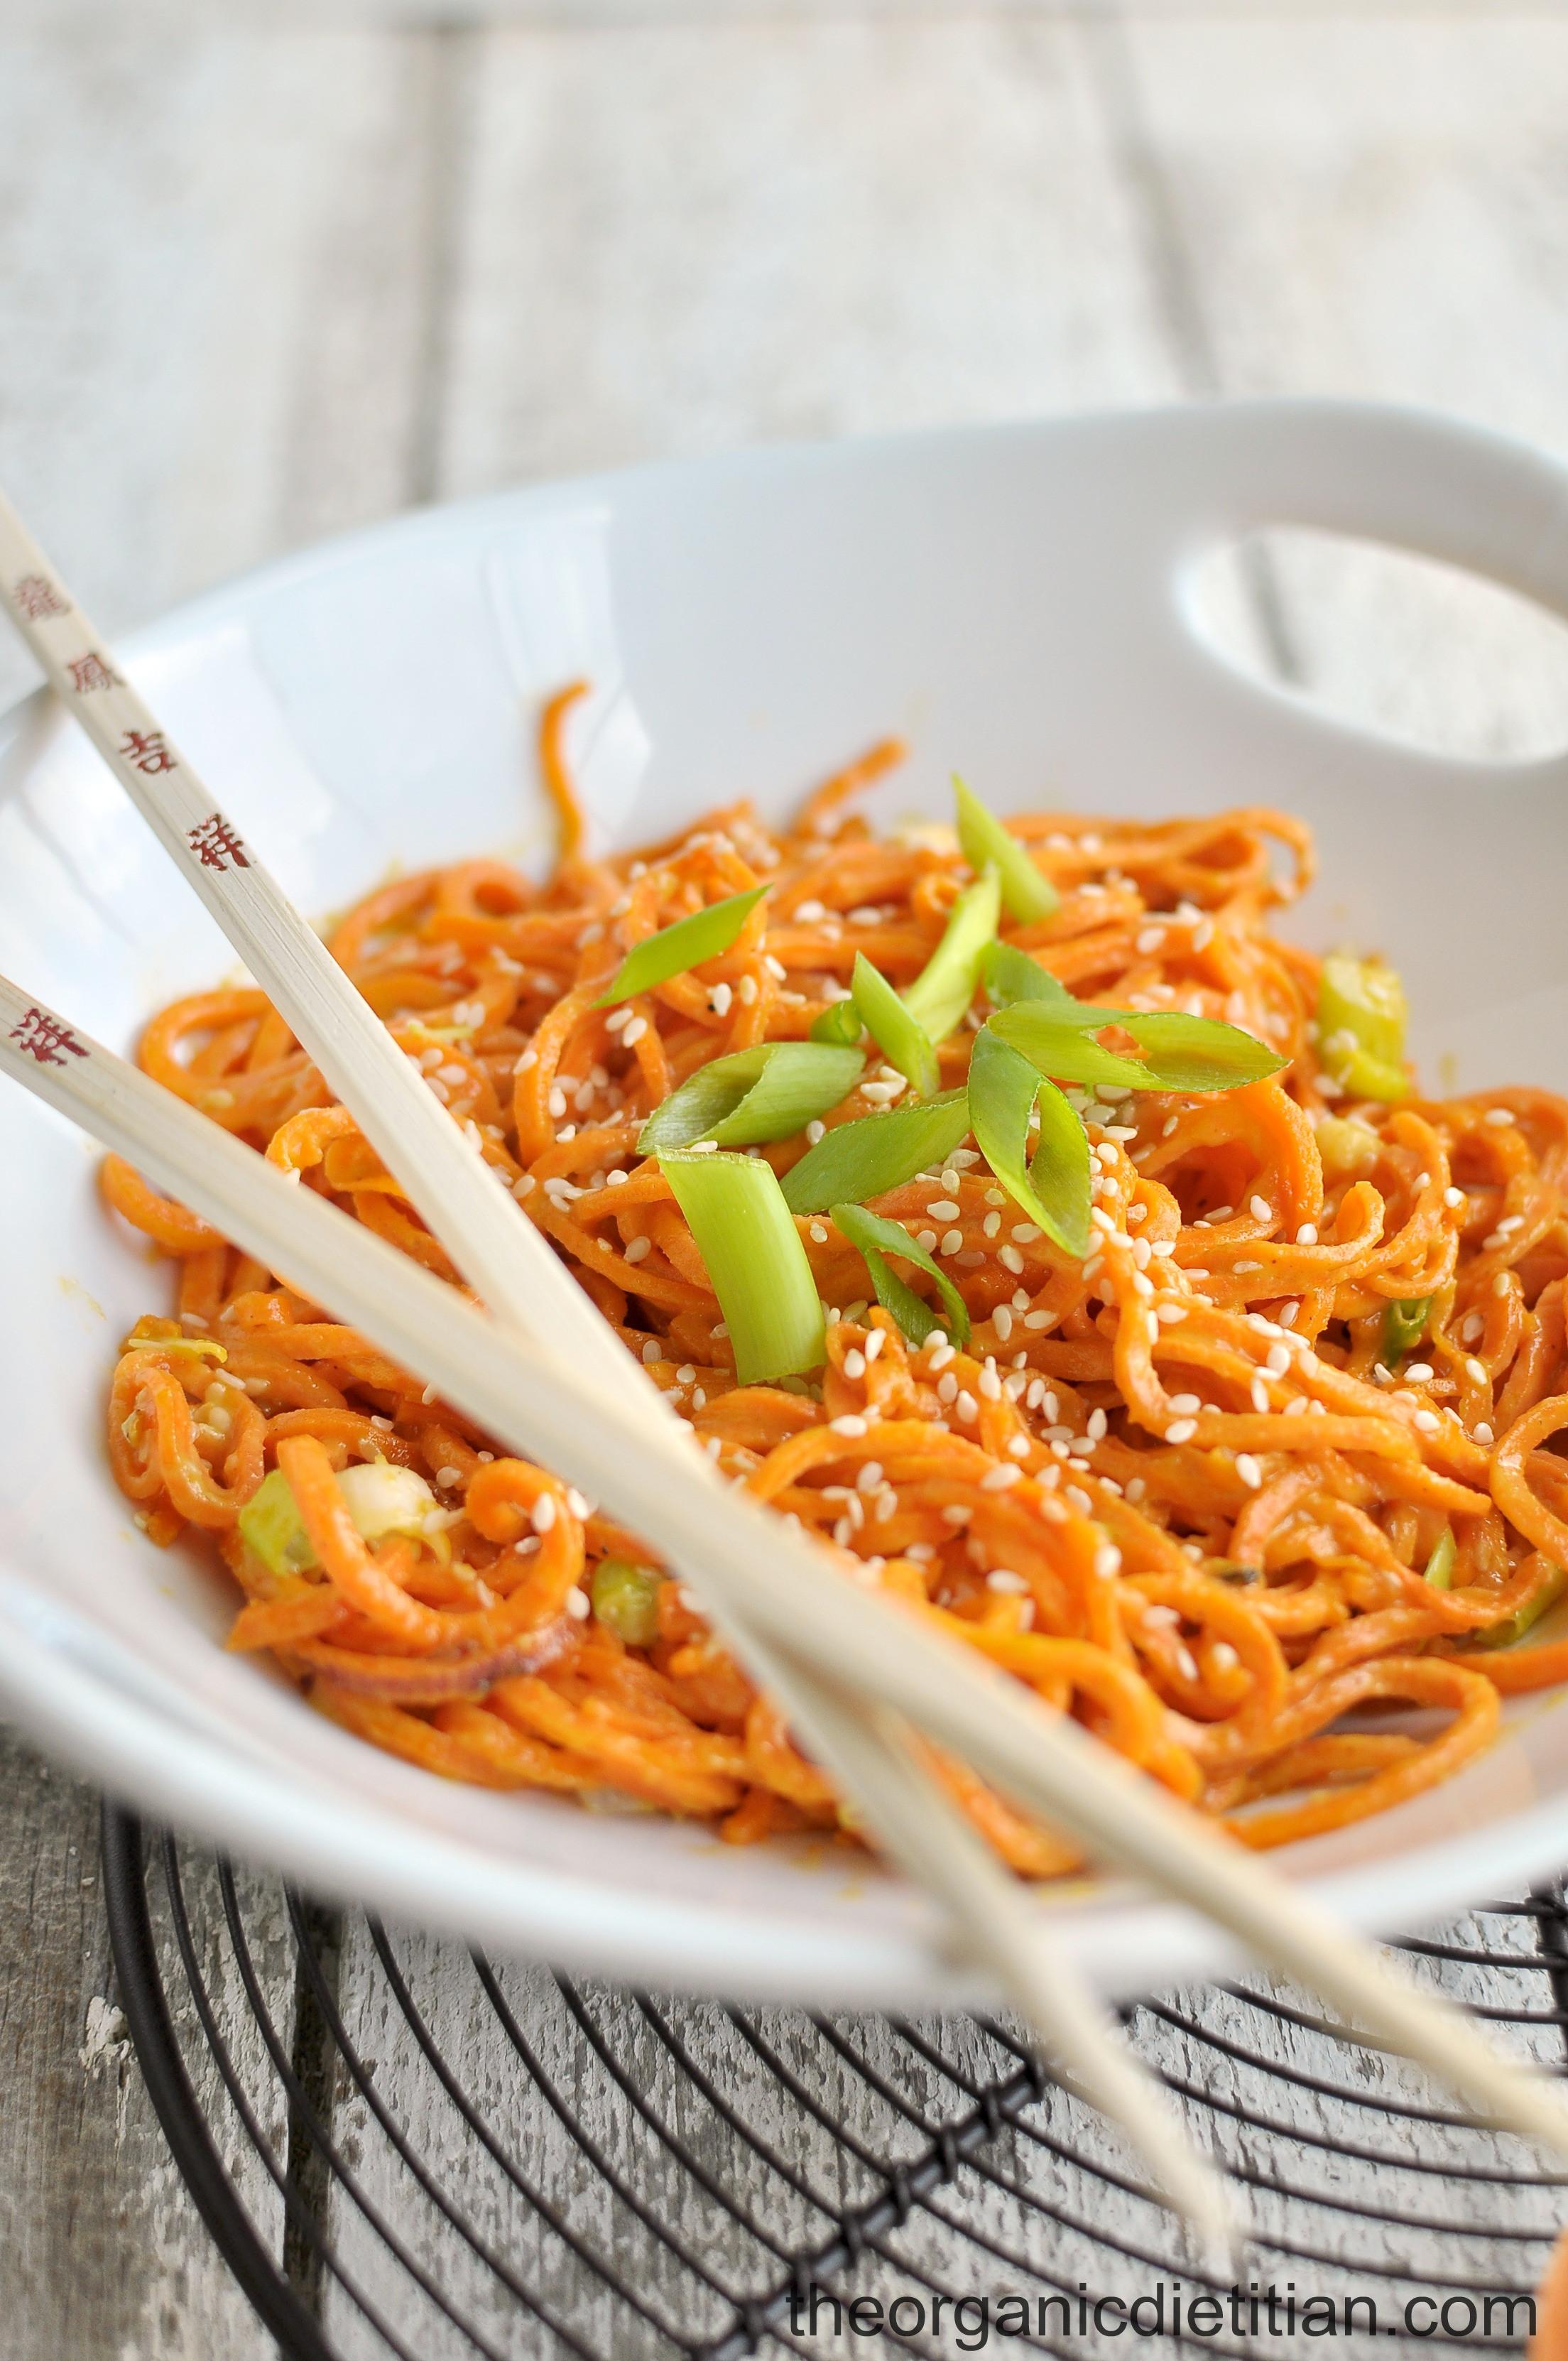 Sweet Potato Noodles  Sesame Sweet Potato Noodles The Organic Dietitian